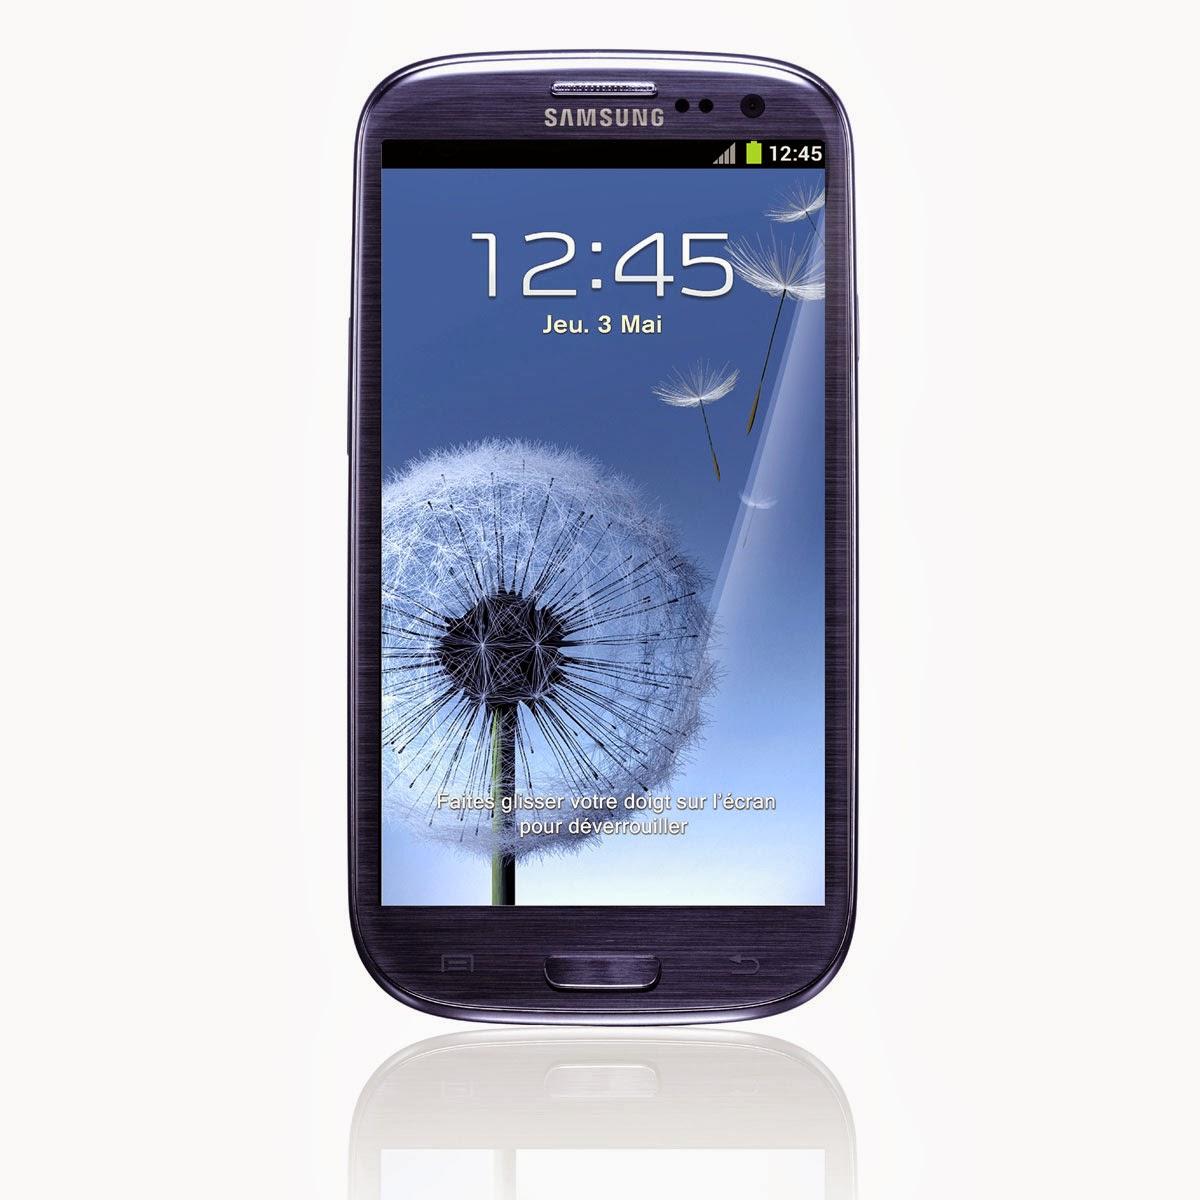 Samsung Galaxy S3 16Go Bleu Comparaison Smartphone